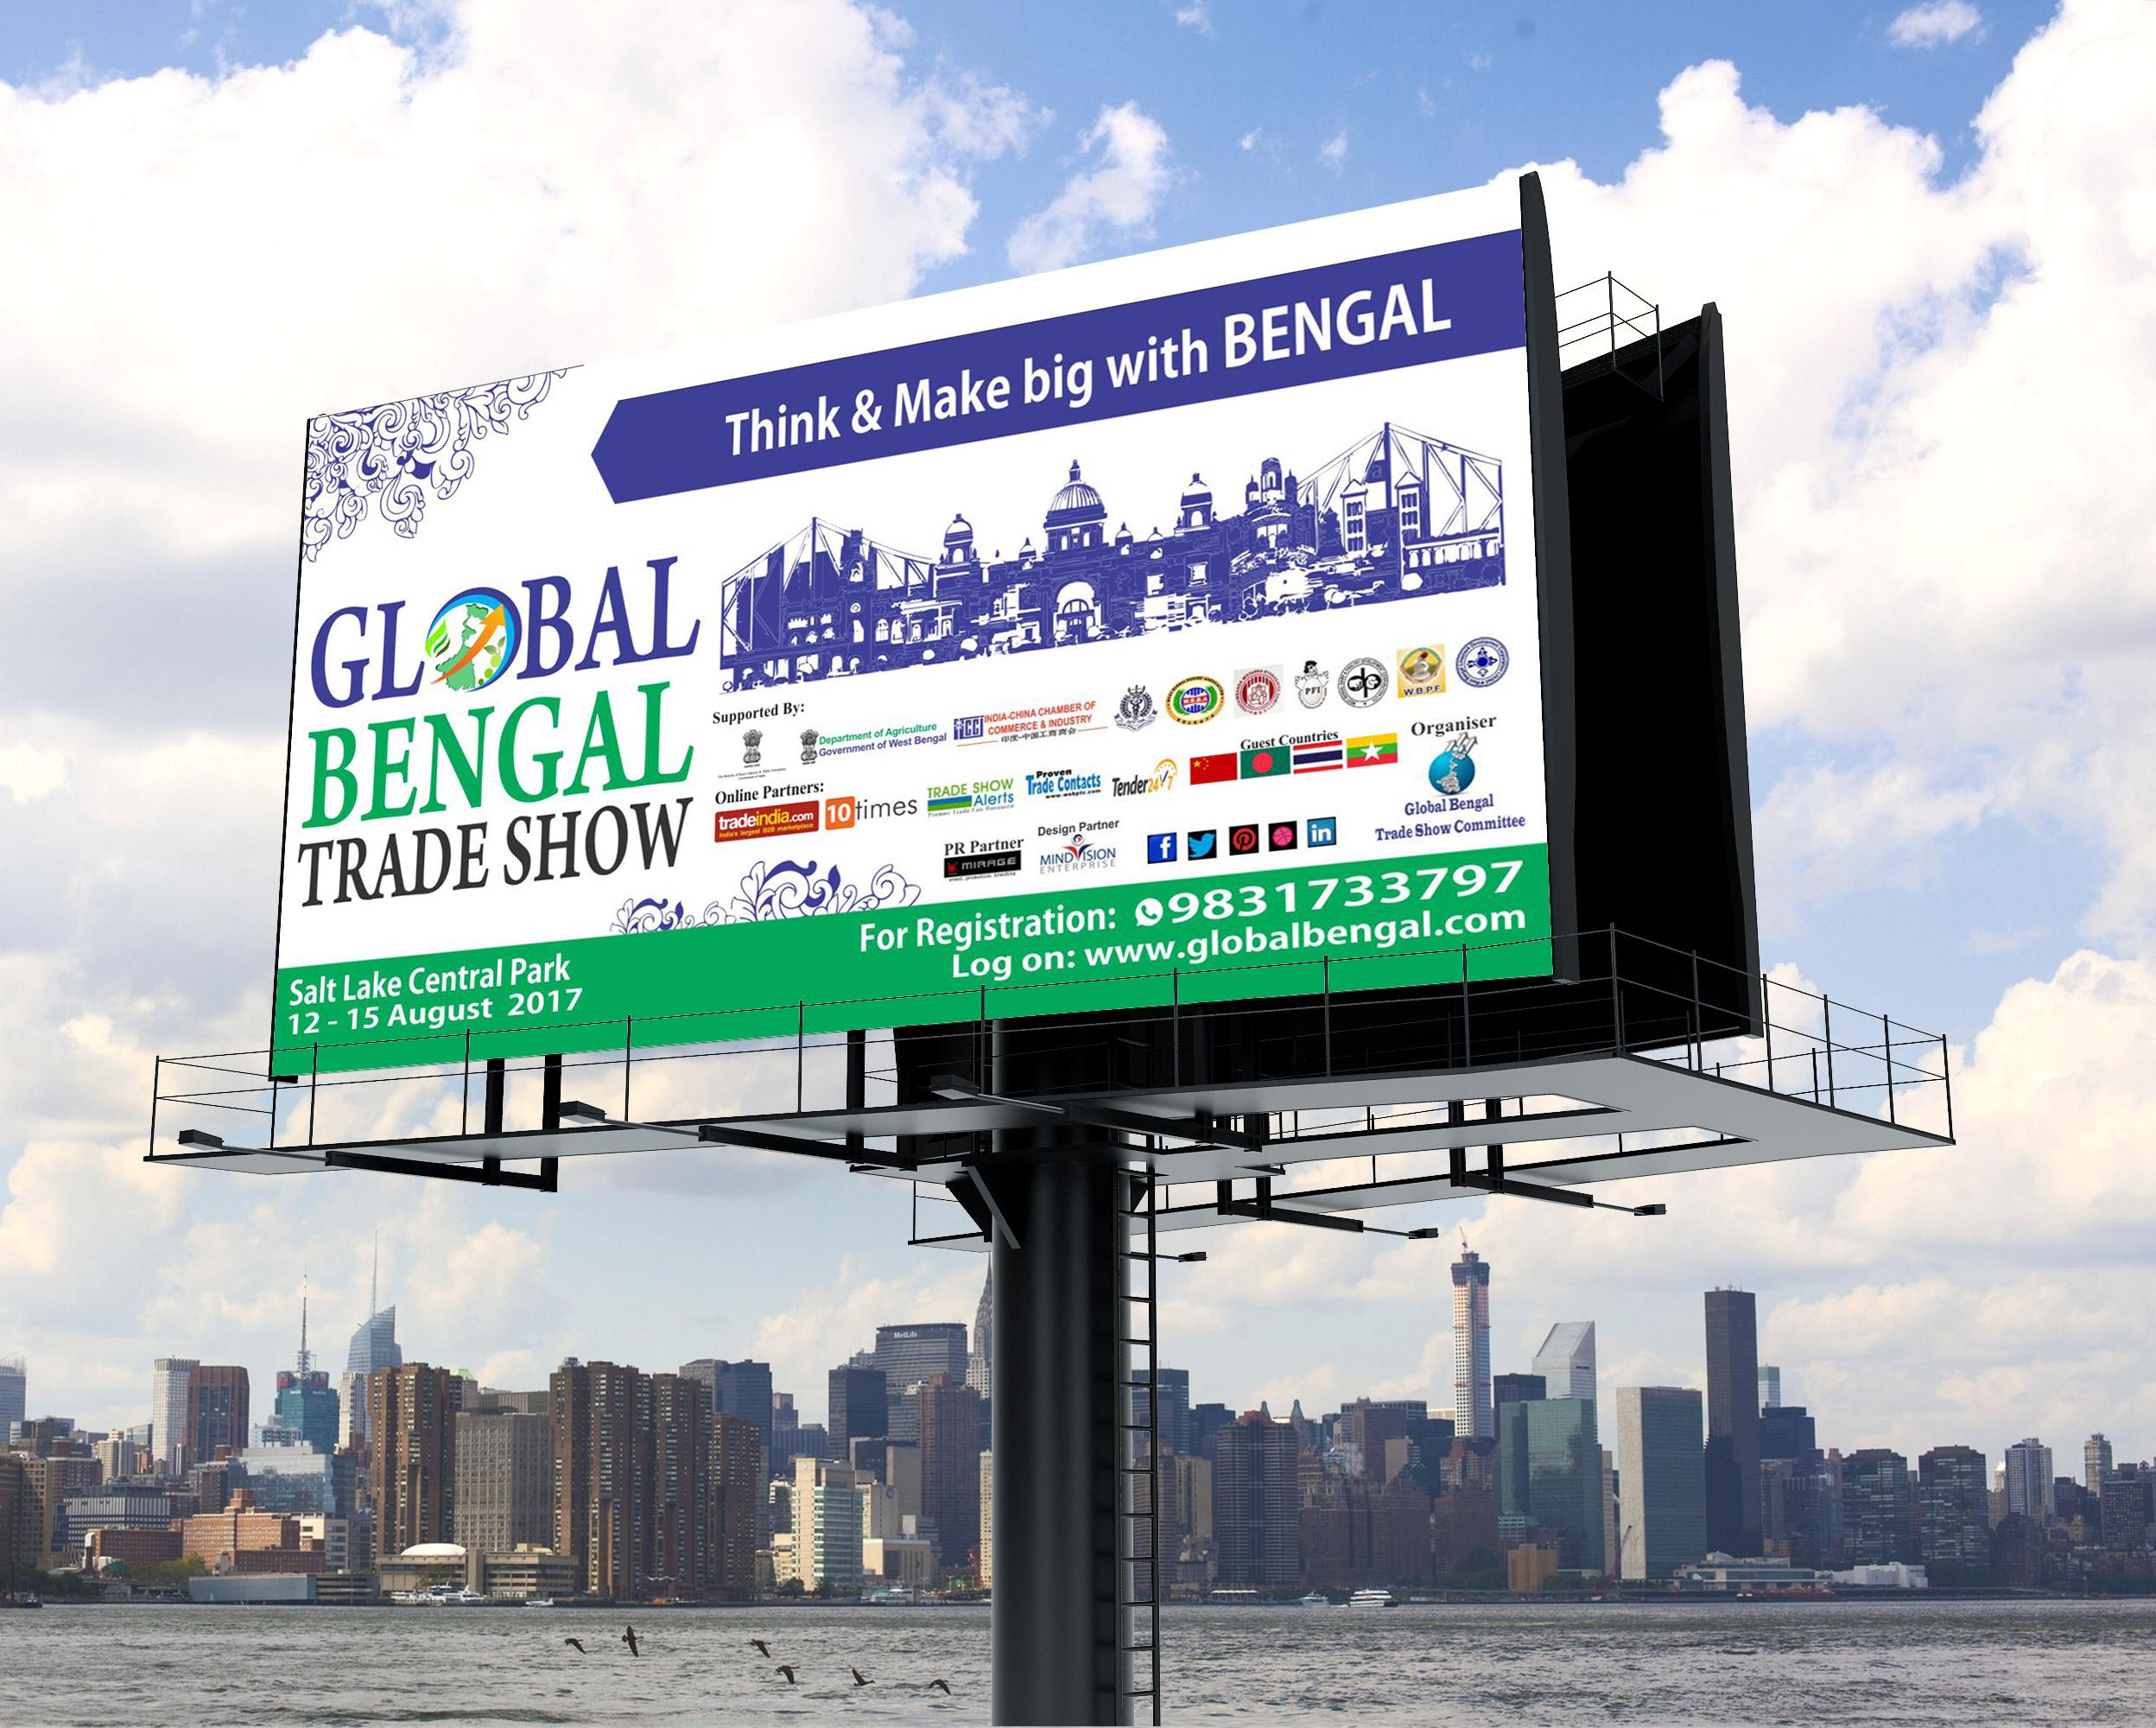 Global Bengal Tradeshow